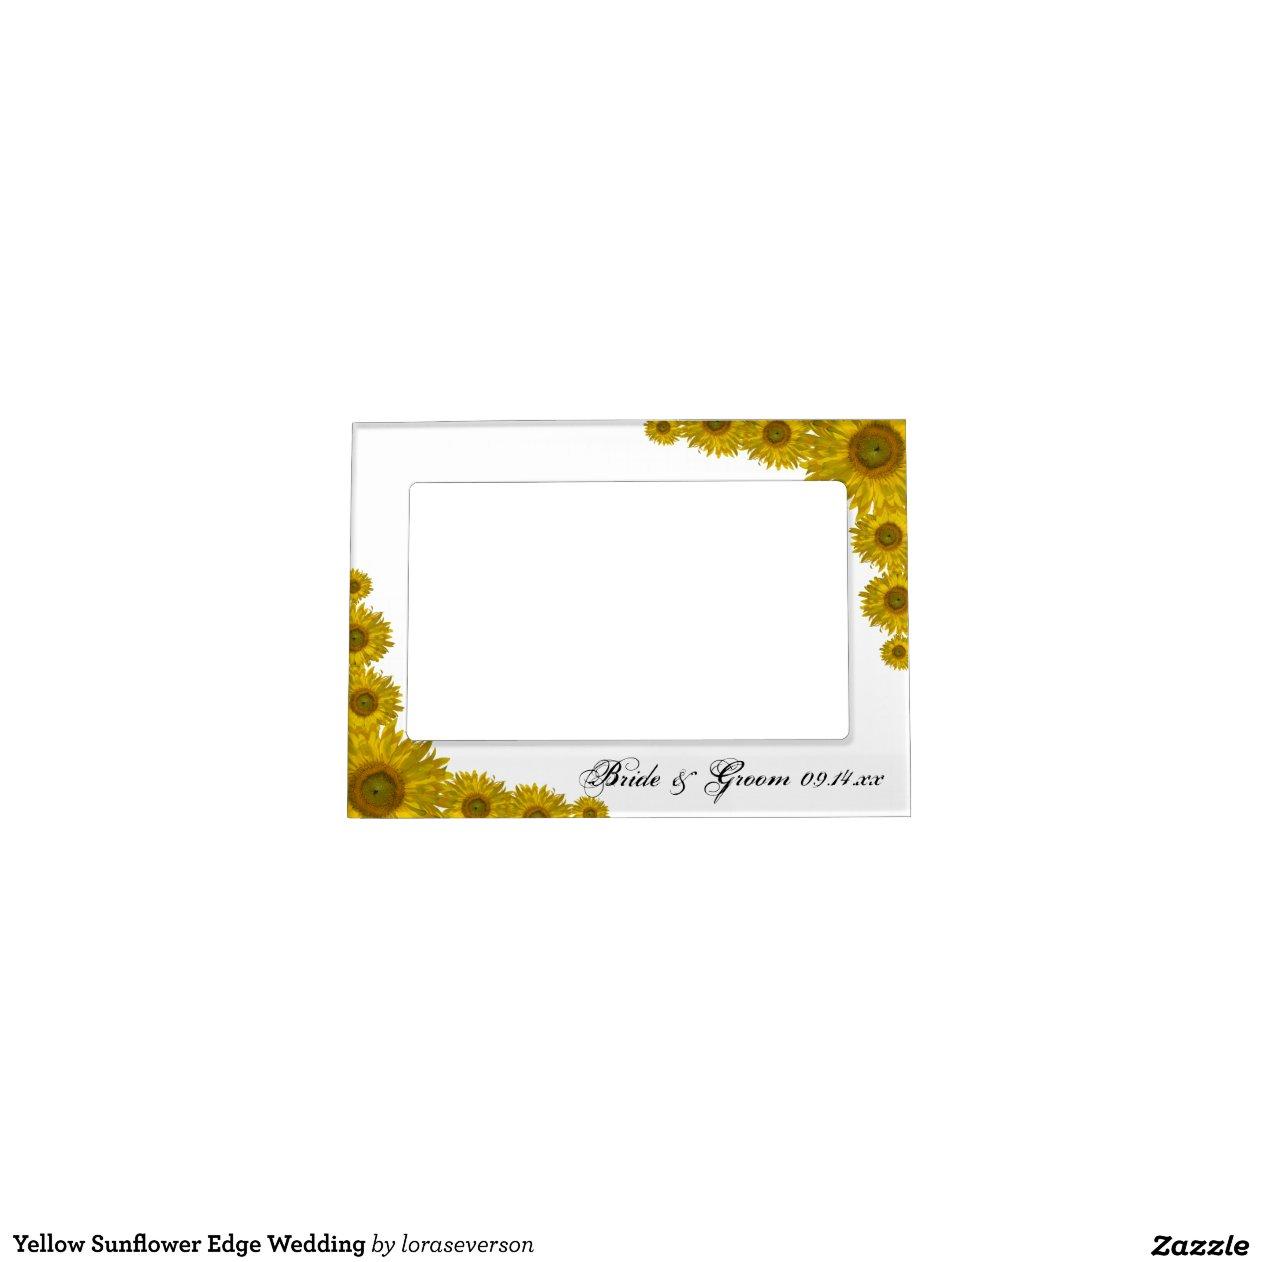 Cadre de tableau jaune de mariage de bord de tourn cadres - Image de cadre de tableau ...